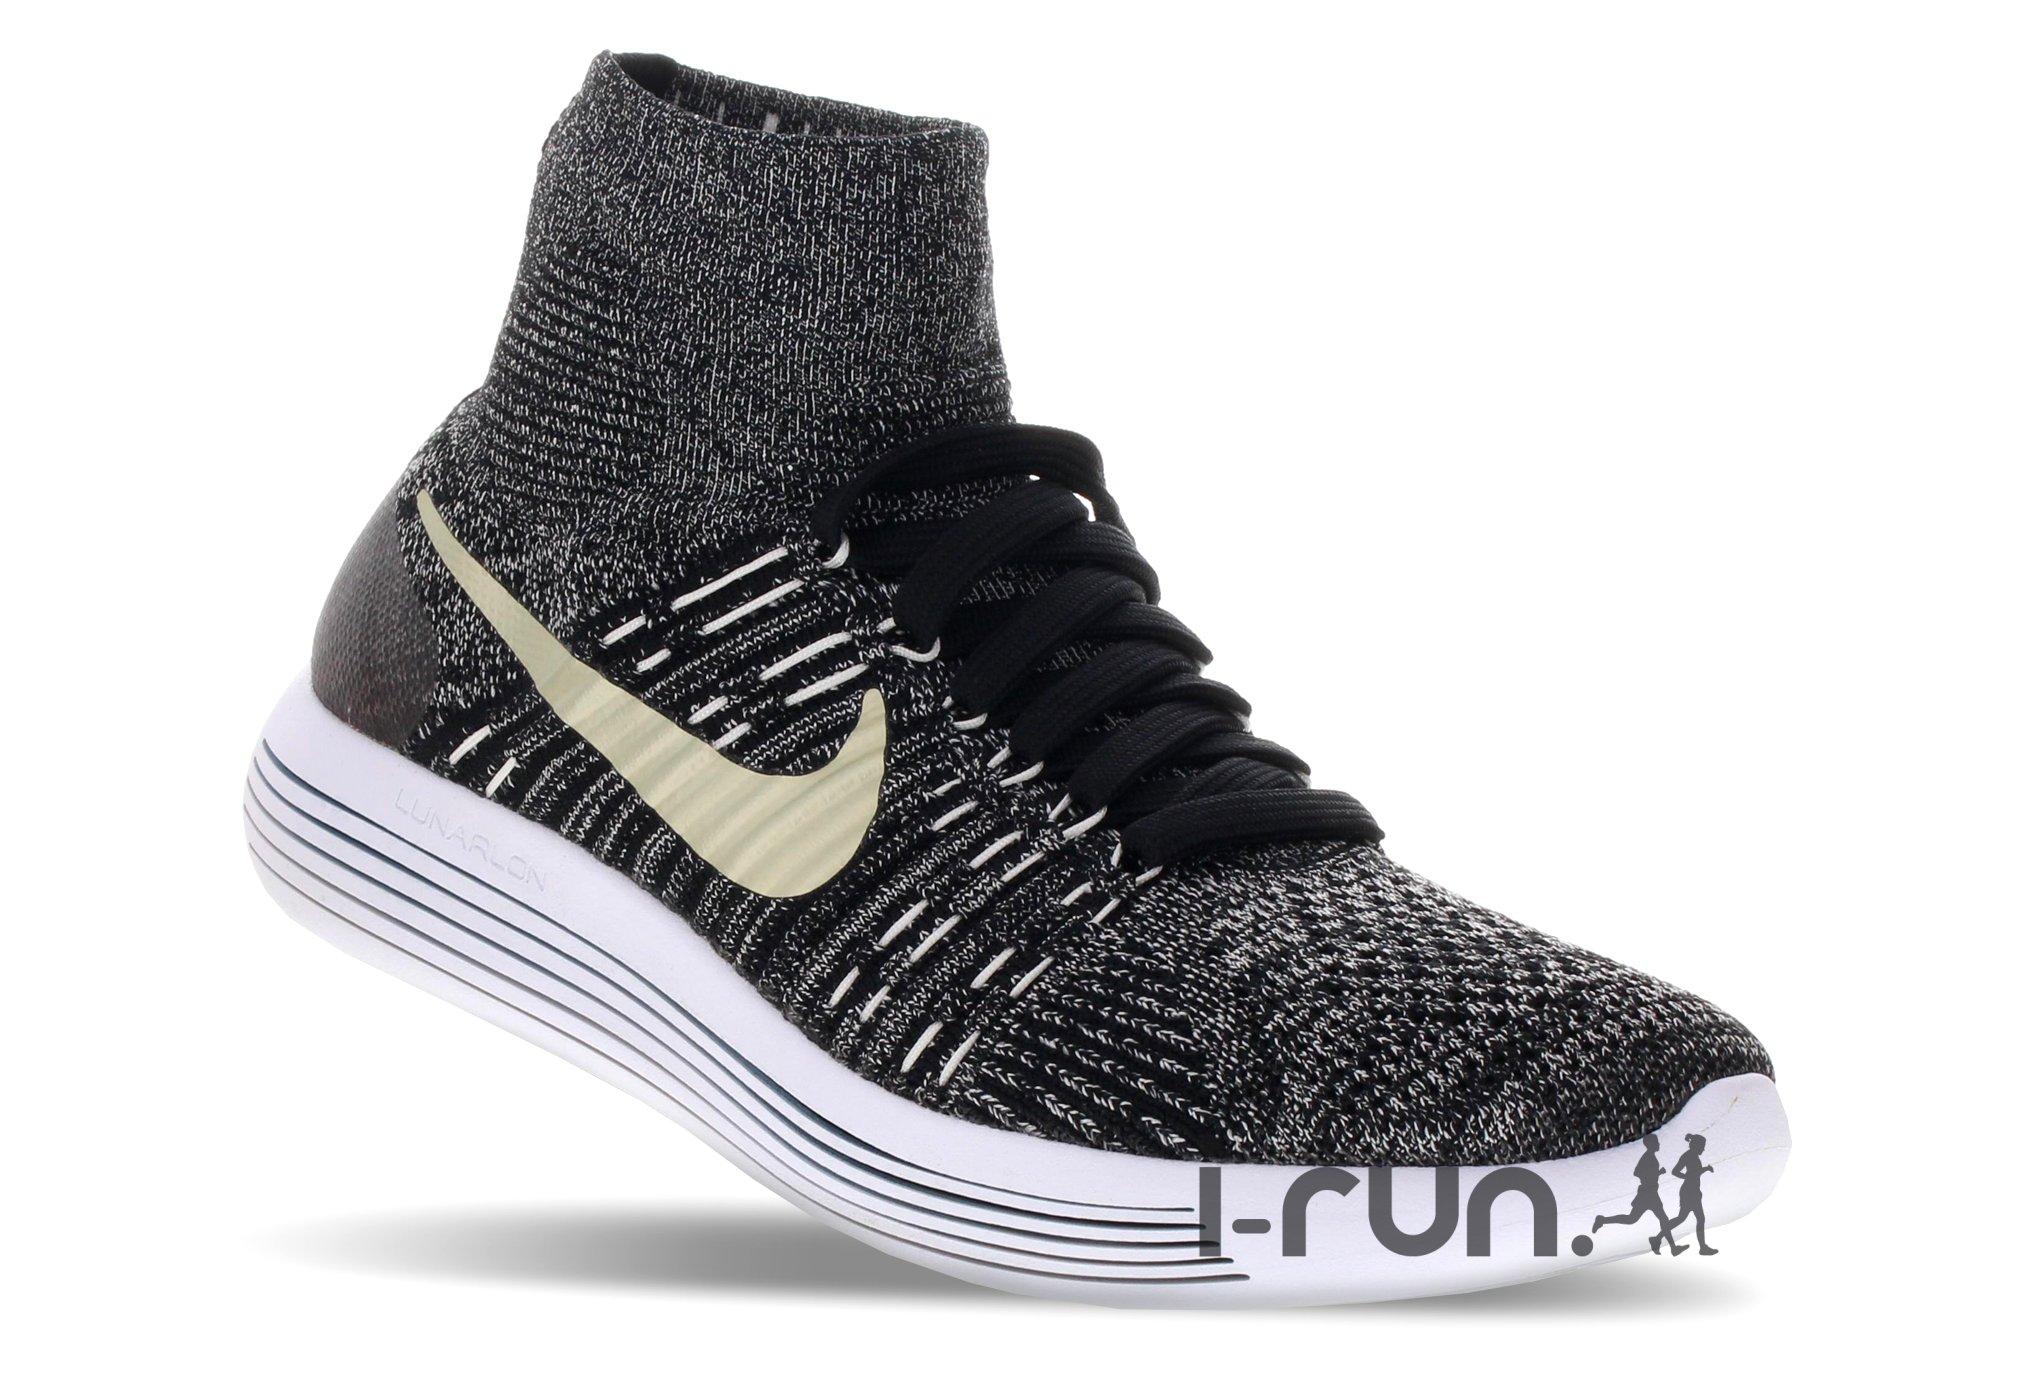 Nike LunarEpic Flyknit Black History Month